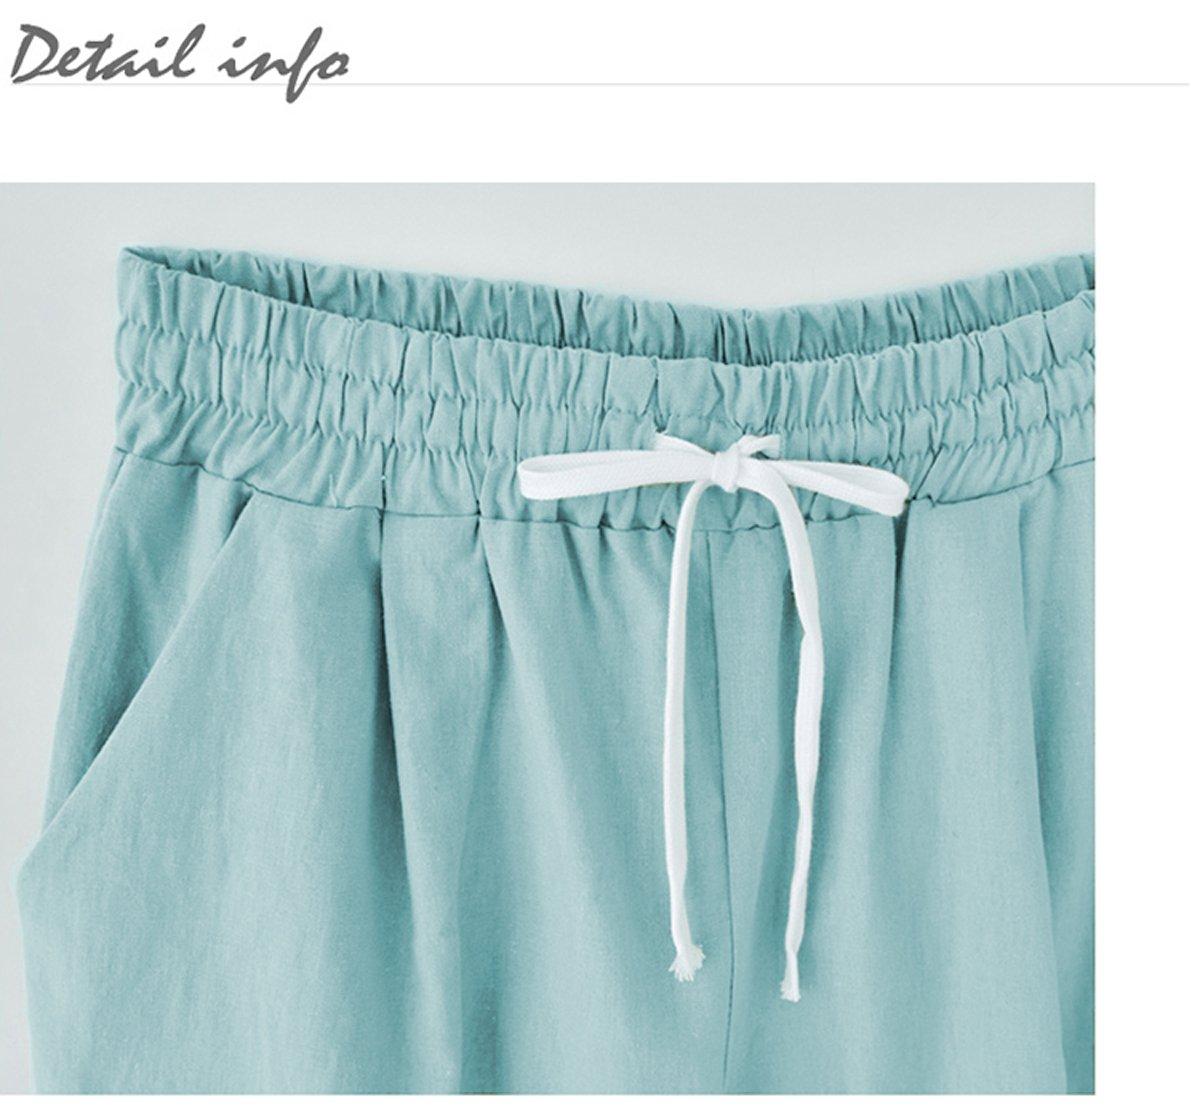 Fuwenni Women's Plus Size Casual Cotton Elastic Waist Knee-Length Bermuda Shorts with Drawstring Black XXL by Fuwenni (Image #2)